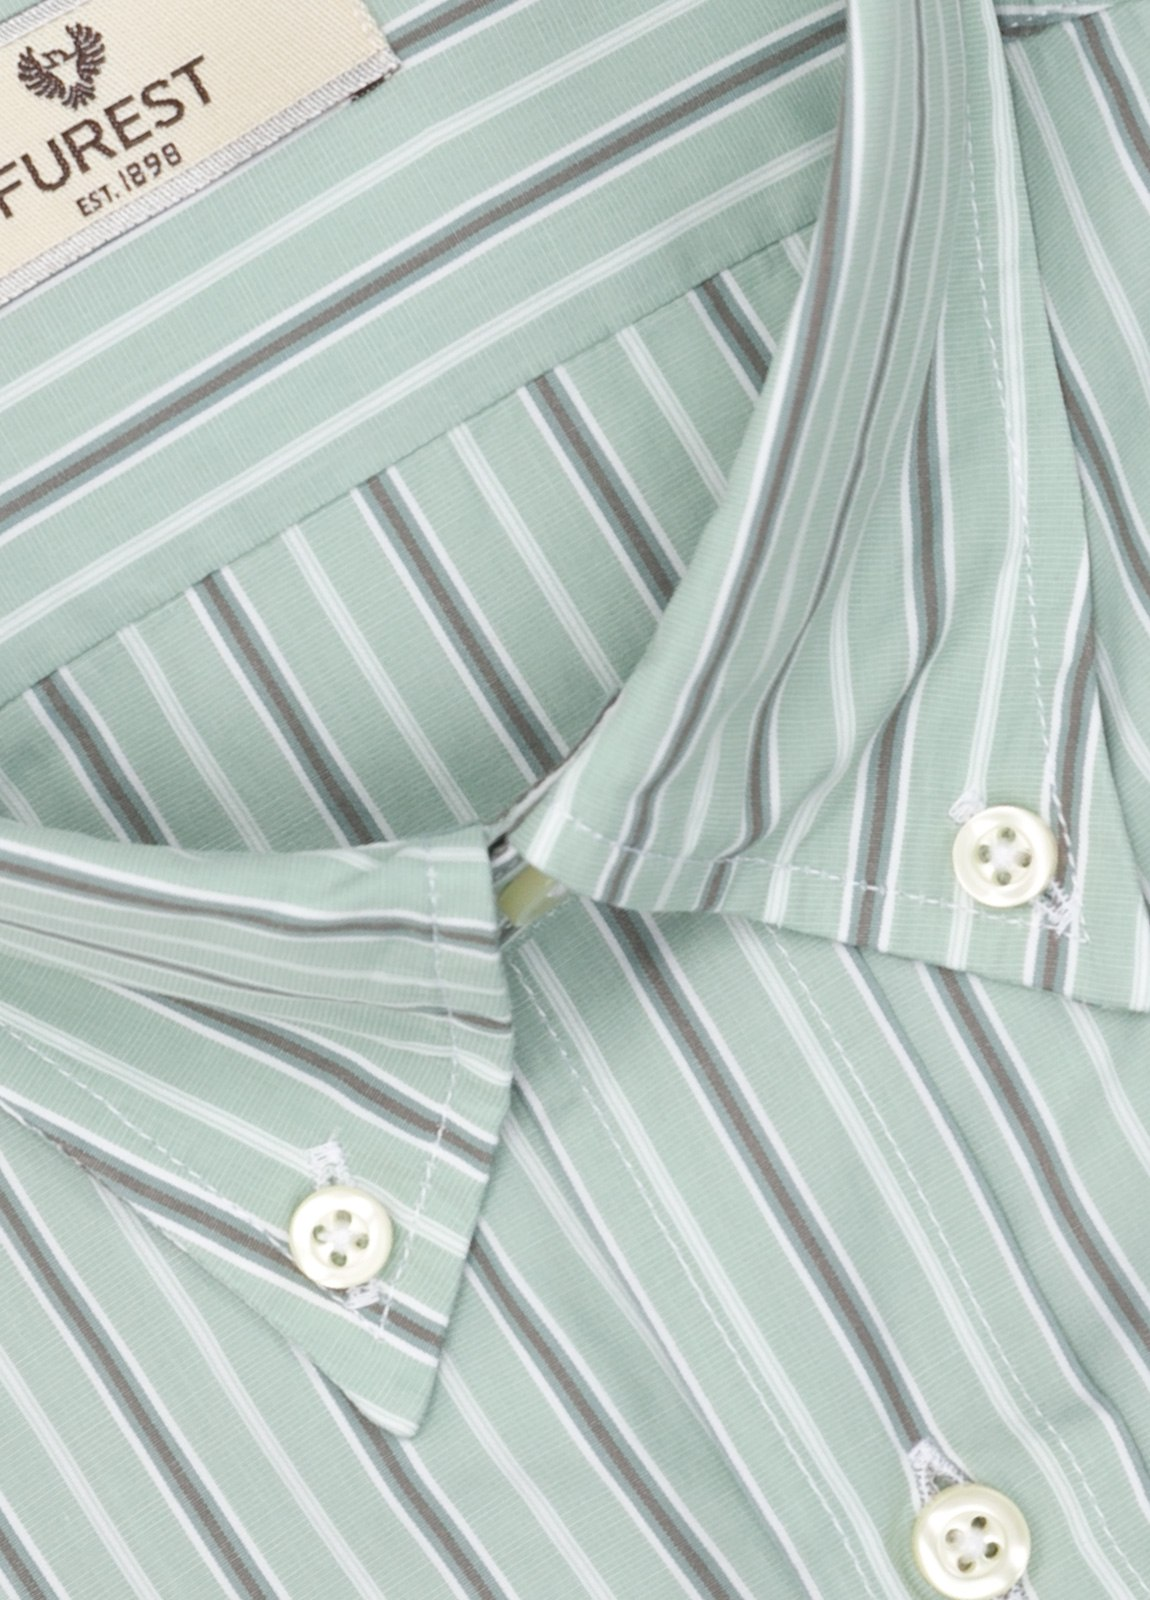 Camisa Leisure Wear SLIM FIT Modelo BOTTON DOWN color verde, estampado rayas gris. 100% Algodón. - Ítem1